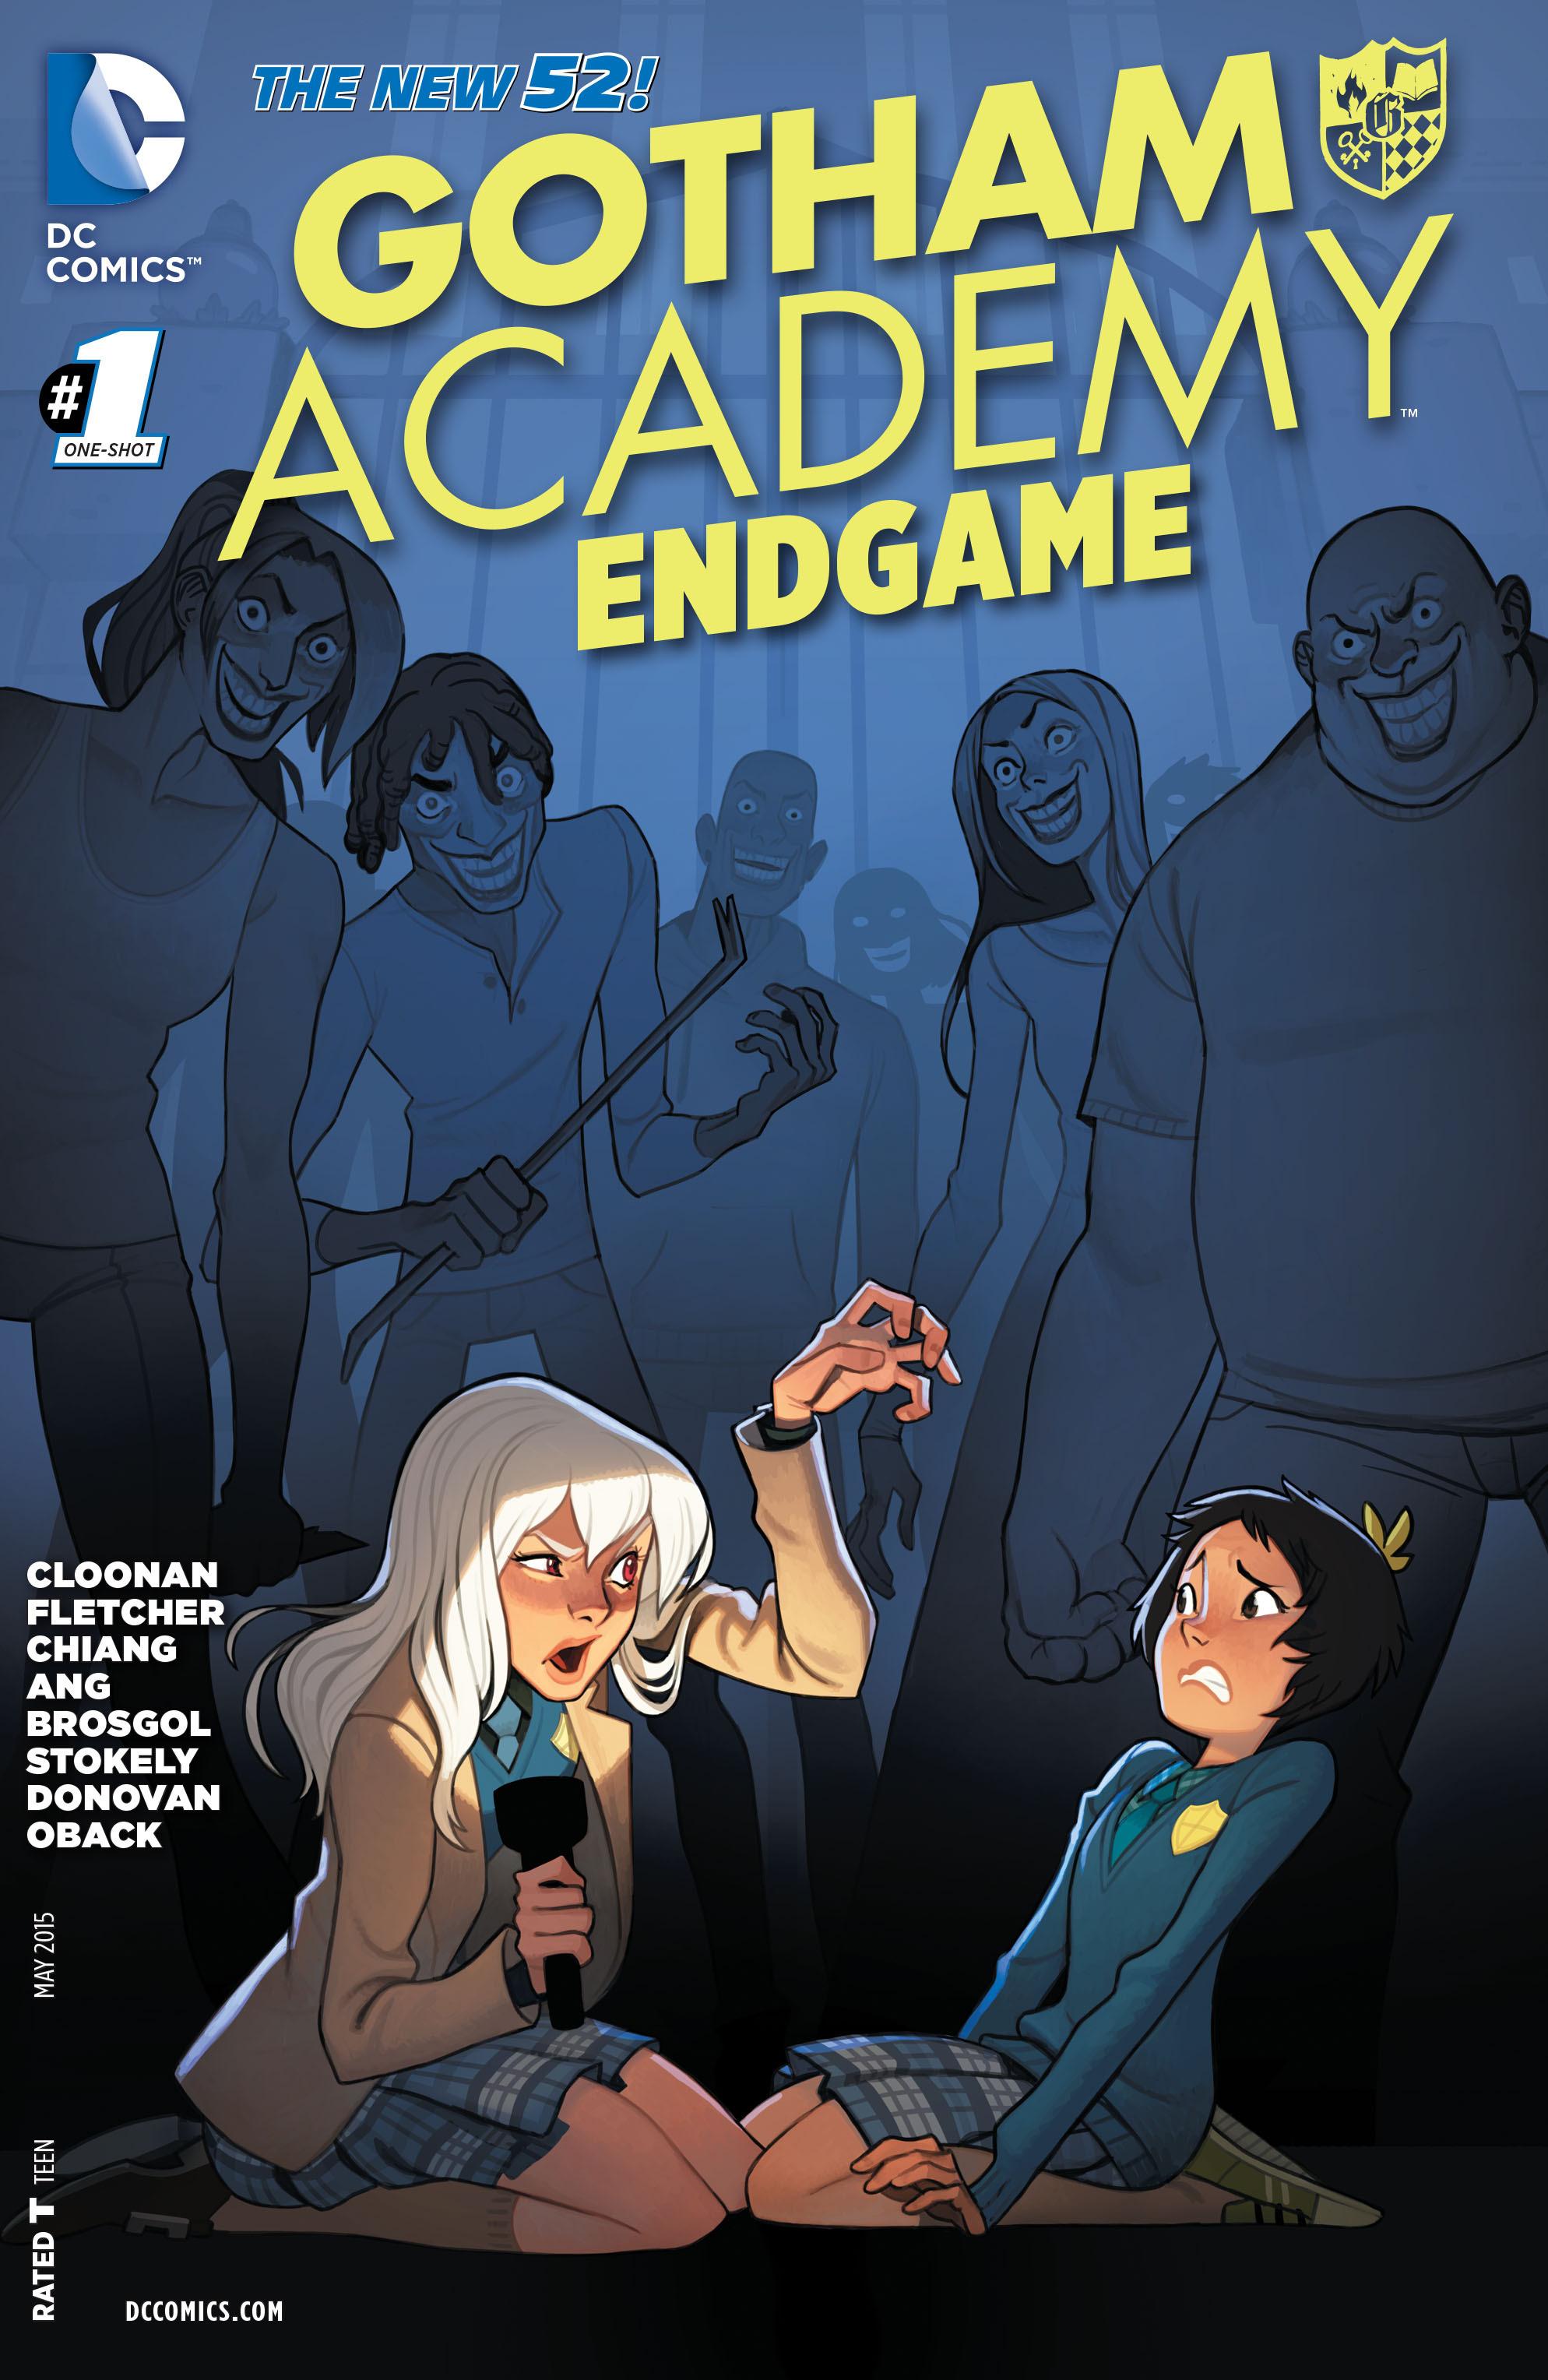 Gotham academy - Endgame 1